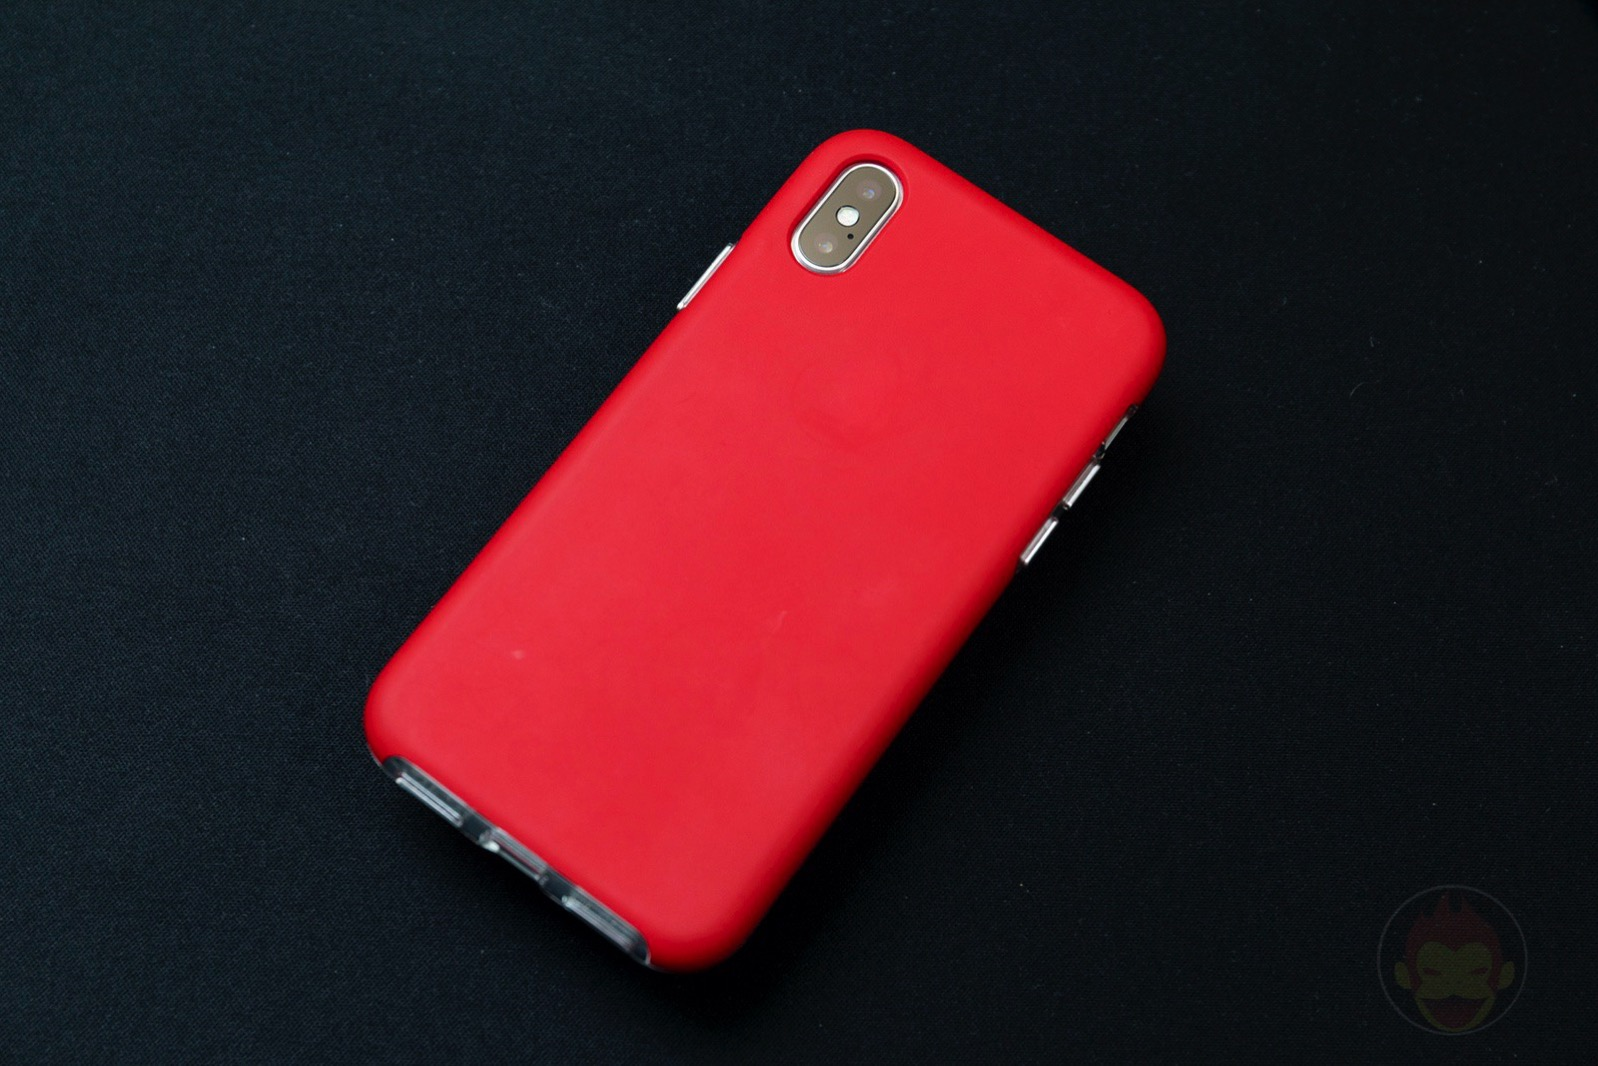 PhoneFoam-Dual-Skin-iPhoneX-Case-11.jpg